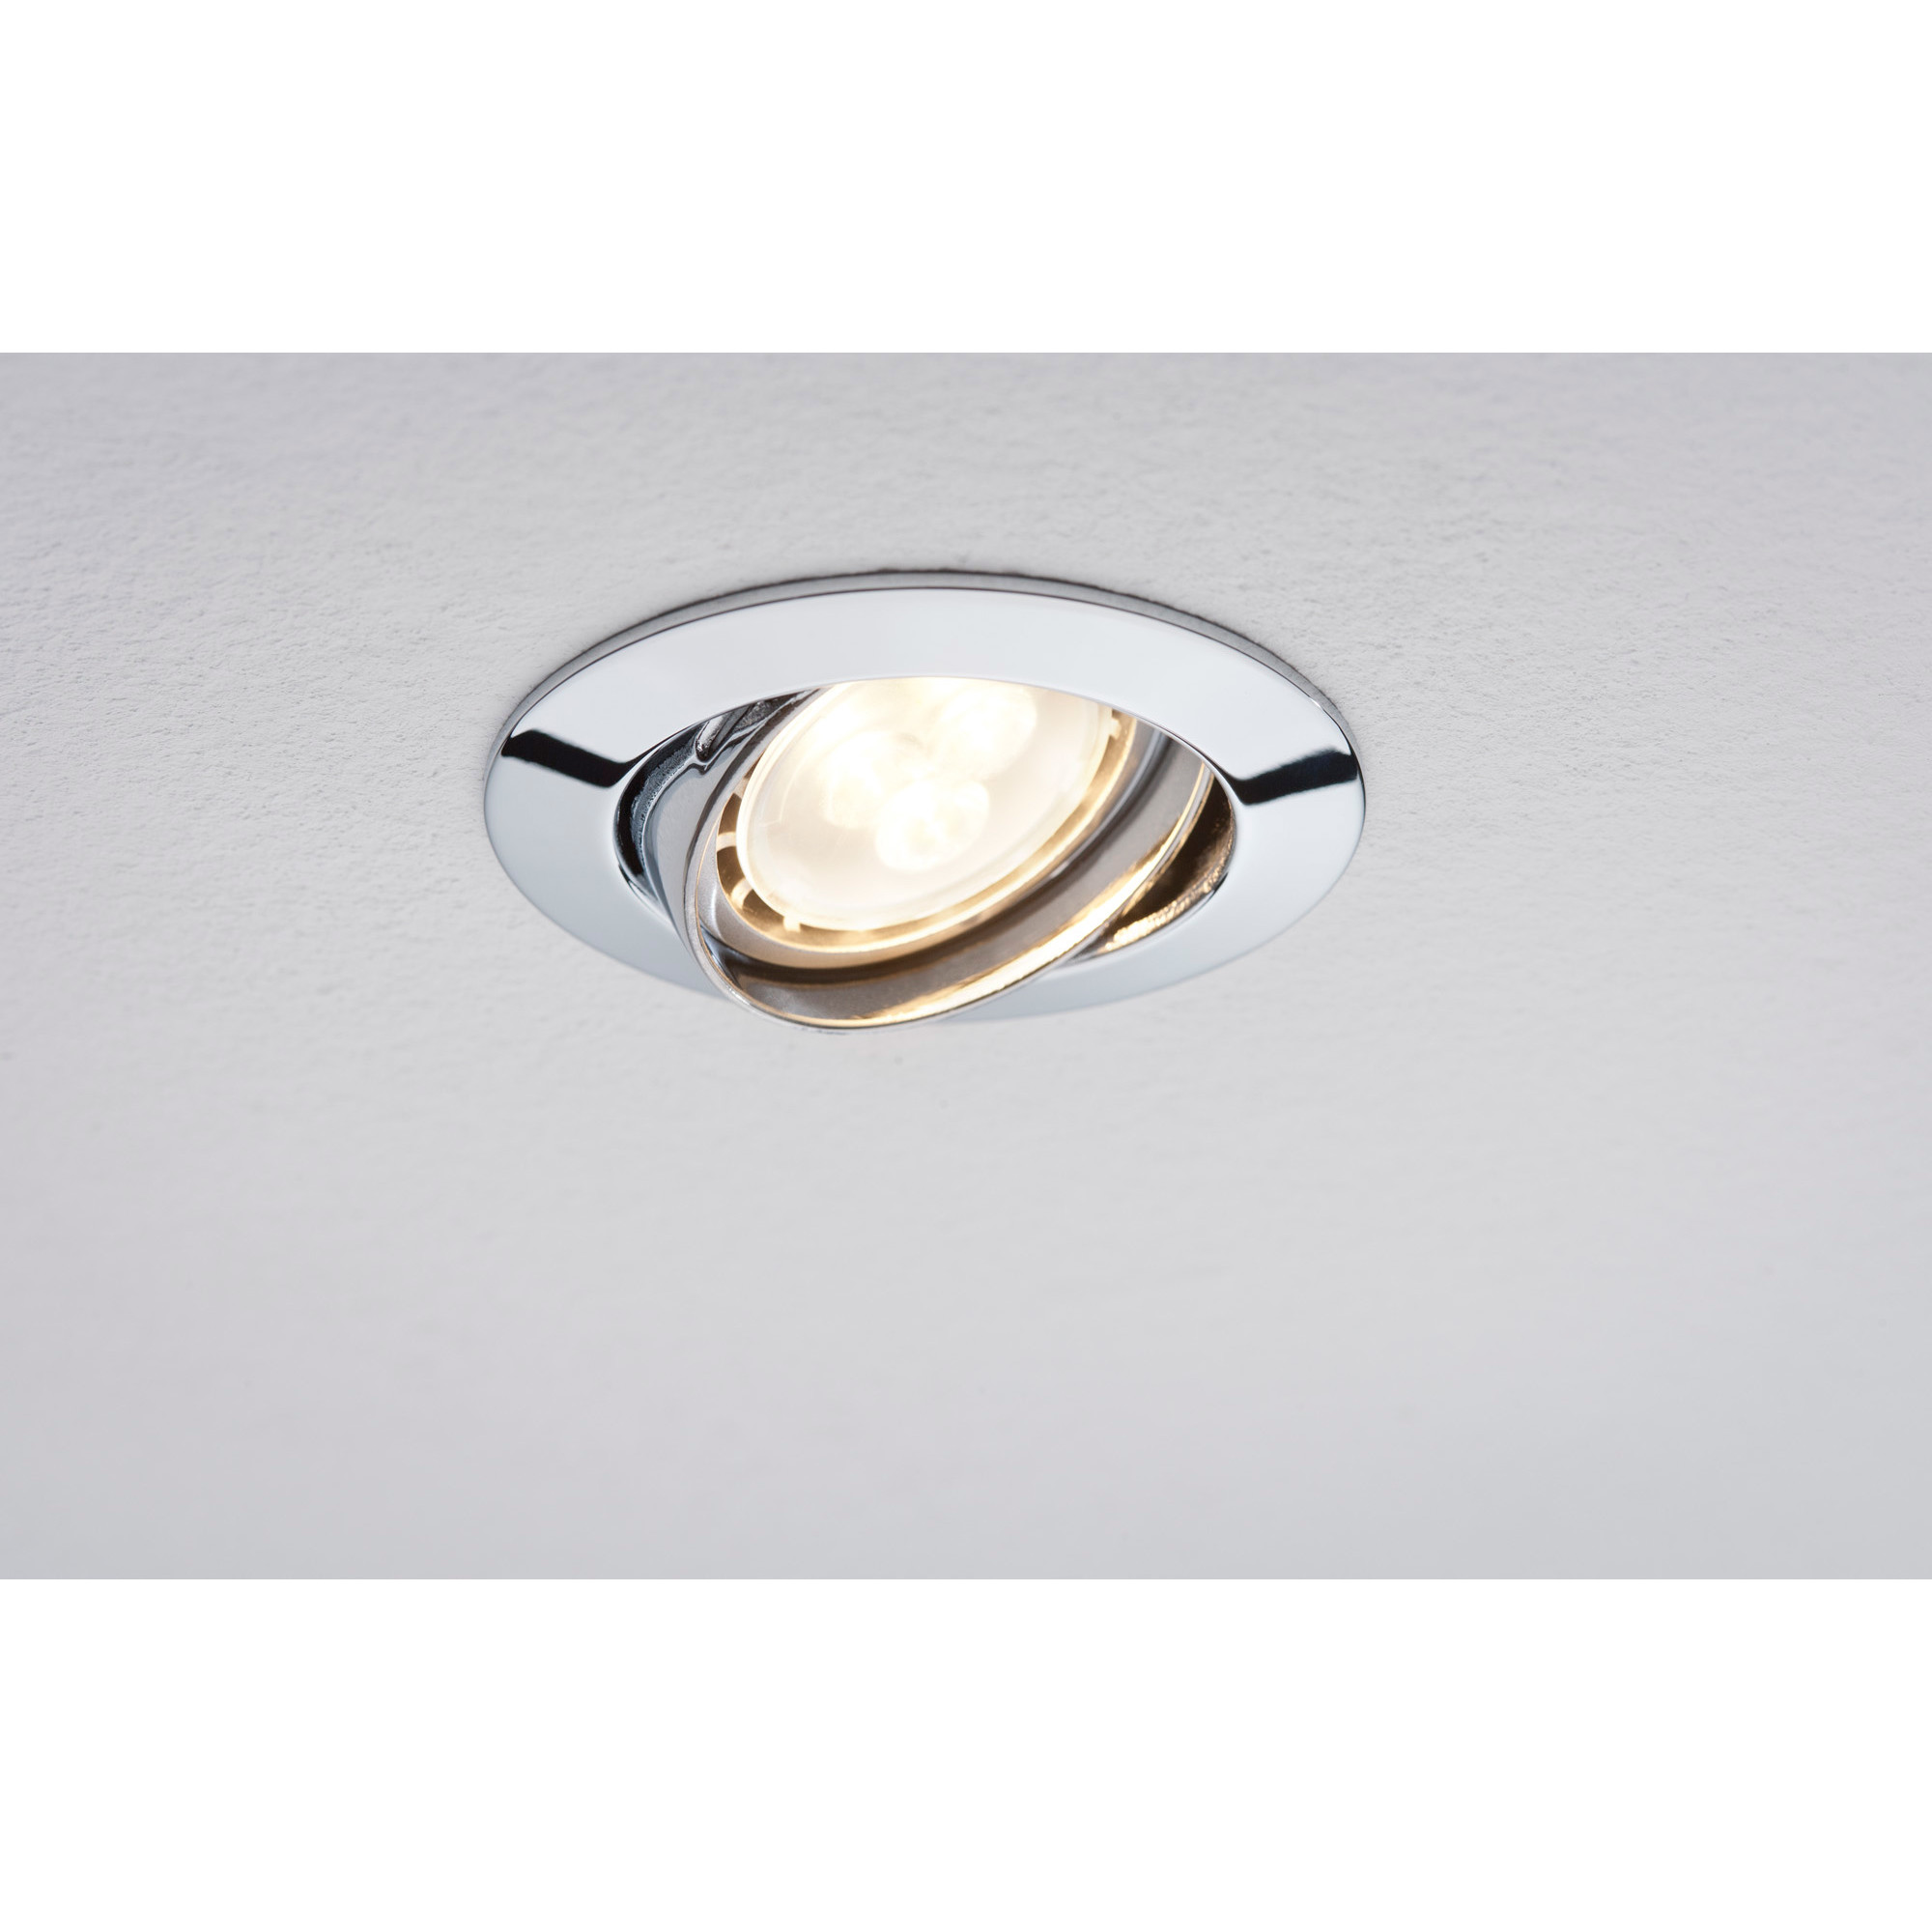 Лампа светодиодная Paulmann 28146 GU5.3 290 Лм теплый свет